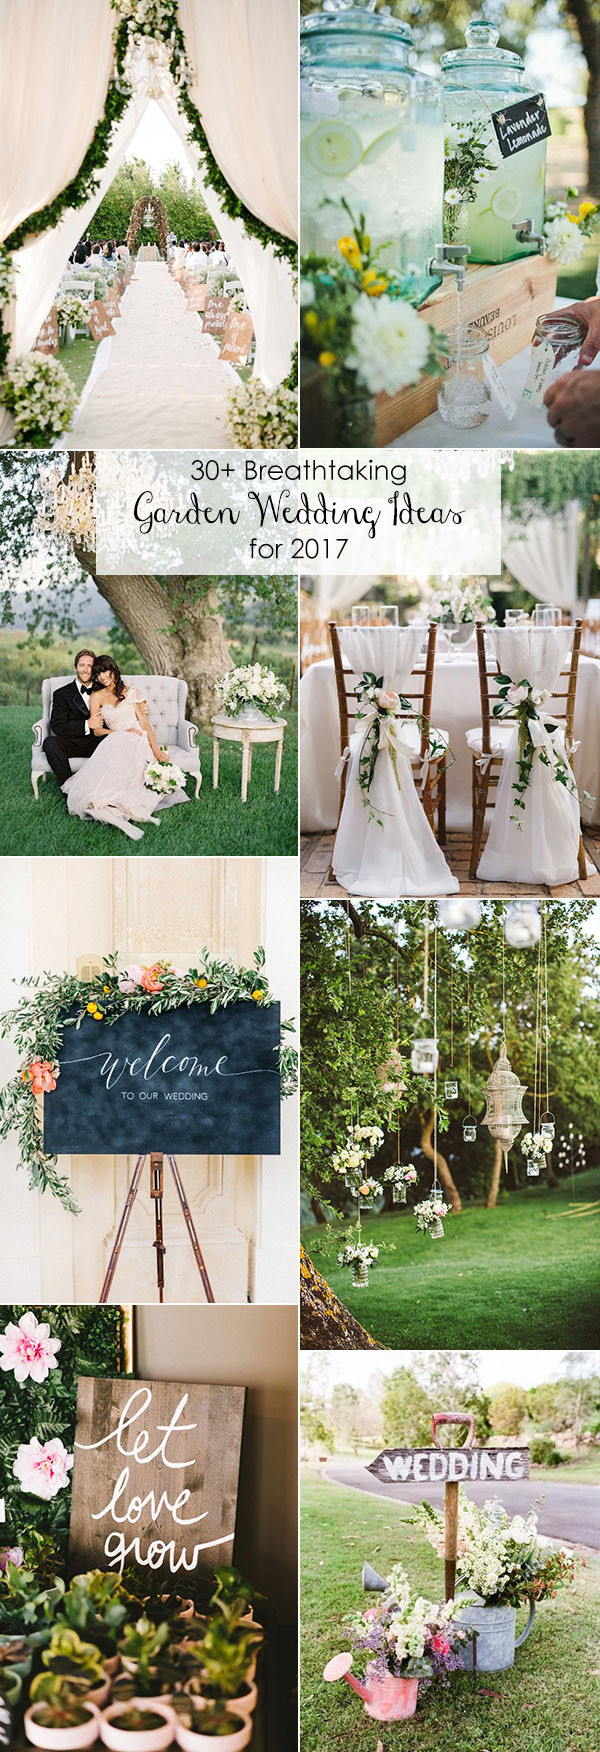 Outdoor Wedding Ideas 30 Totally Breathtaking Garden Wedding Ideas For 2017 Trends Oh